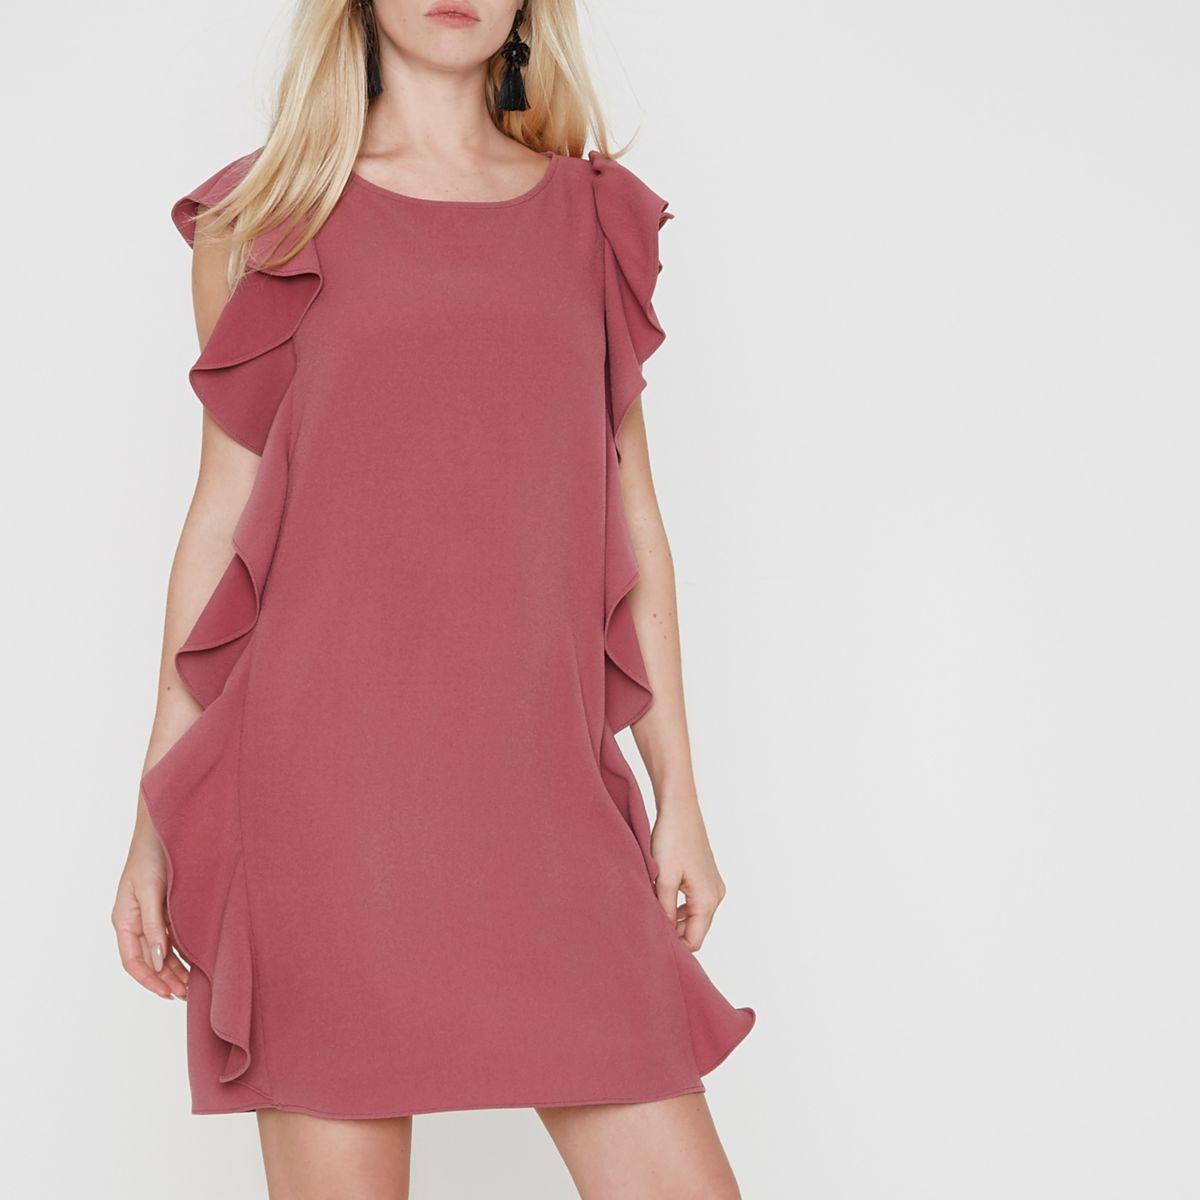 Dark pink frill side sleeveless swing dress